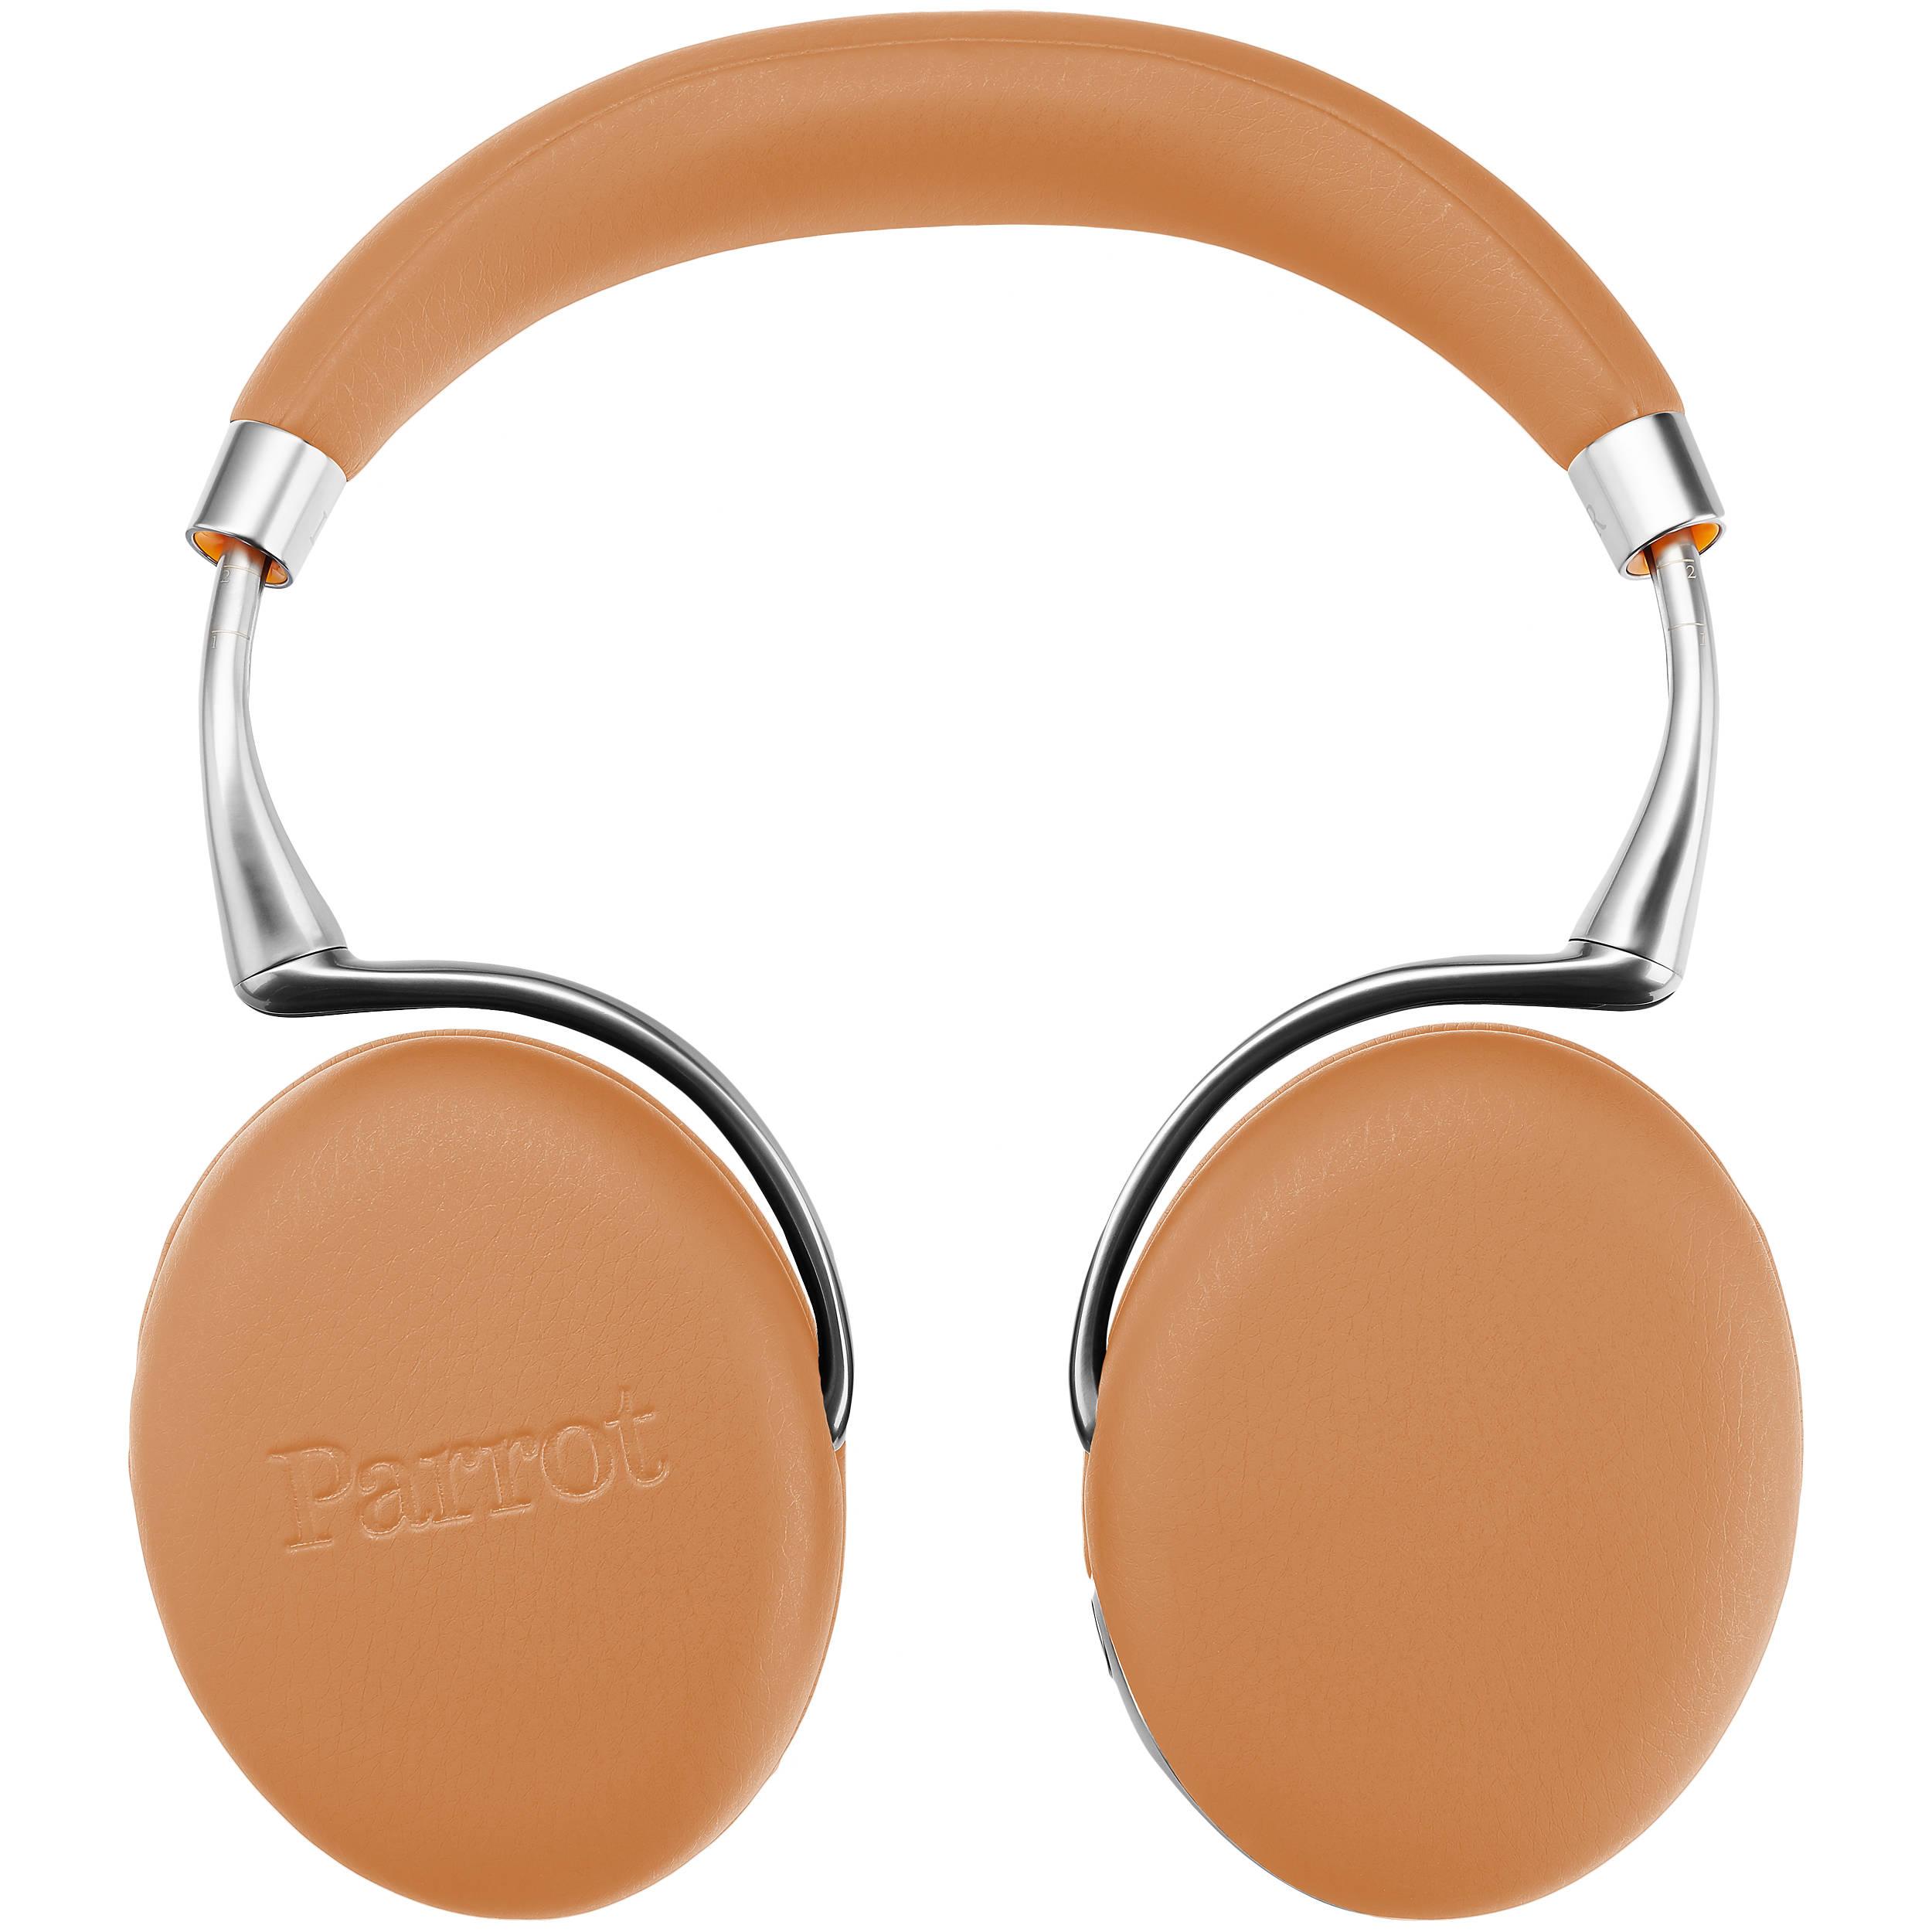 The BASEBALL parrot zik 3 wireless bluetooth stereo headphones was